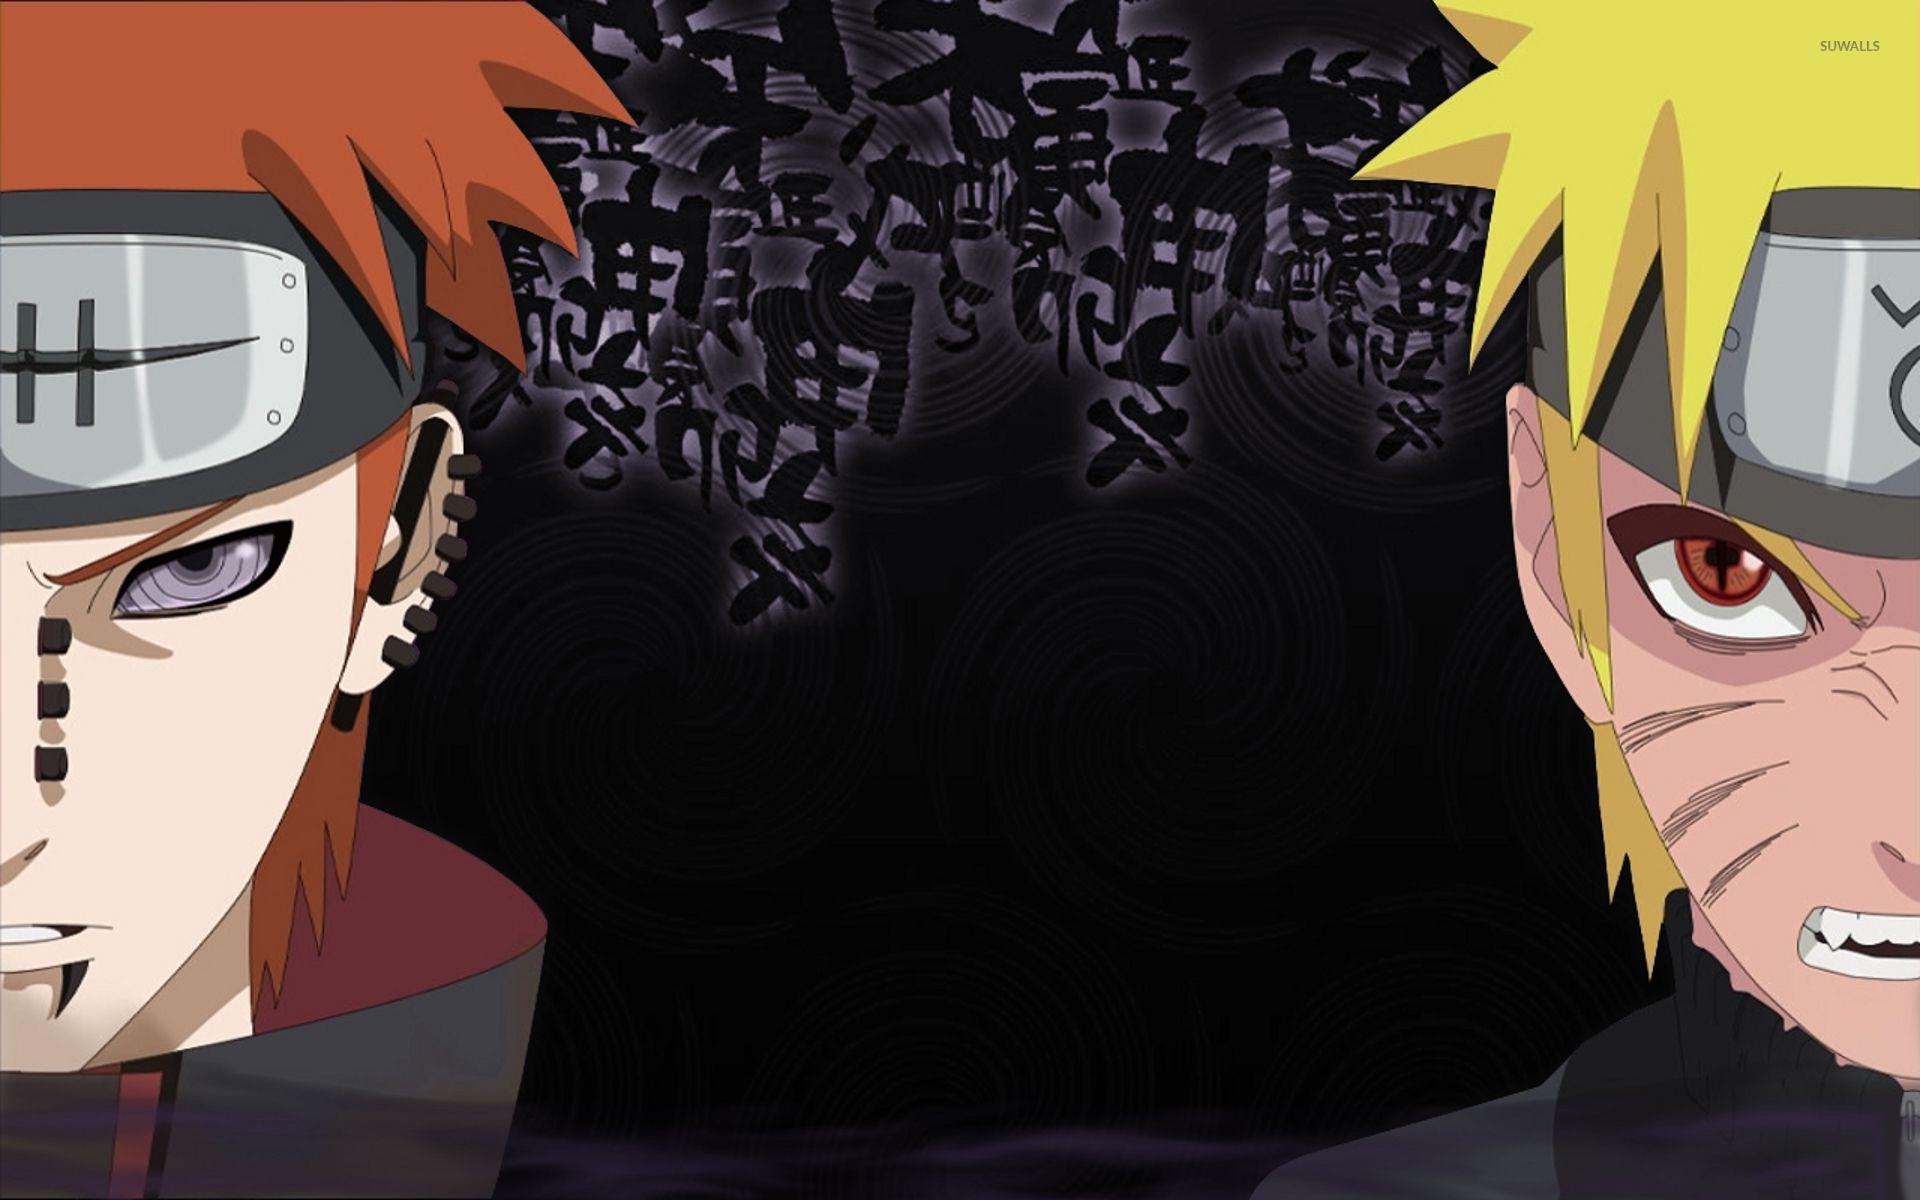 Unduh 53 Wallpaper Anime Naruto Cool Gratis Terbaru